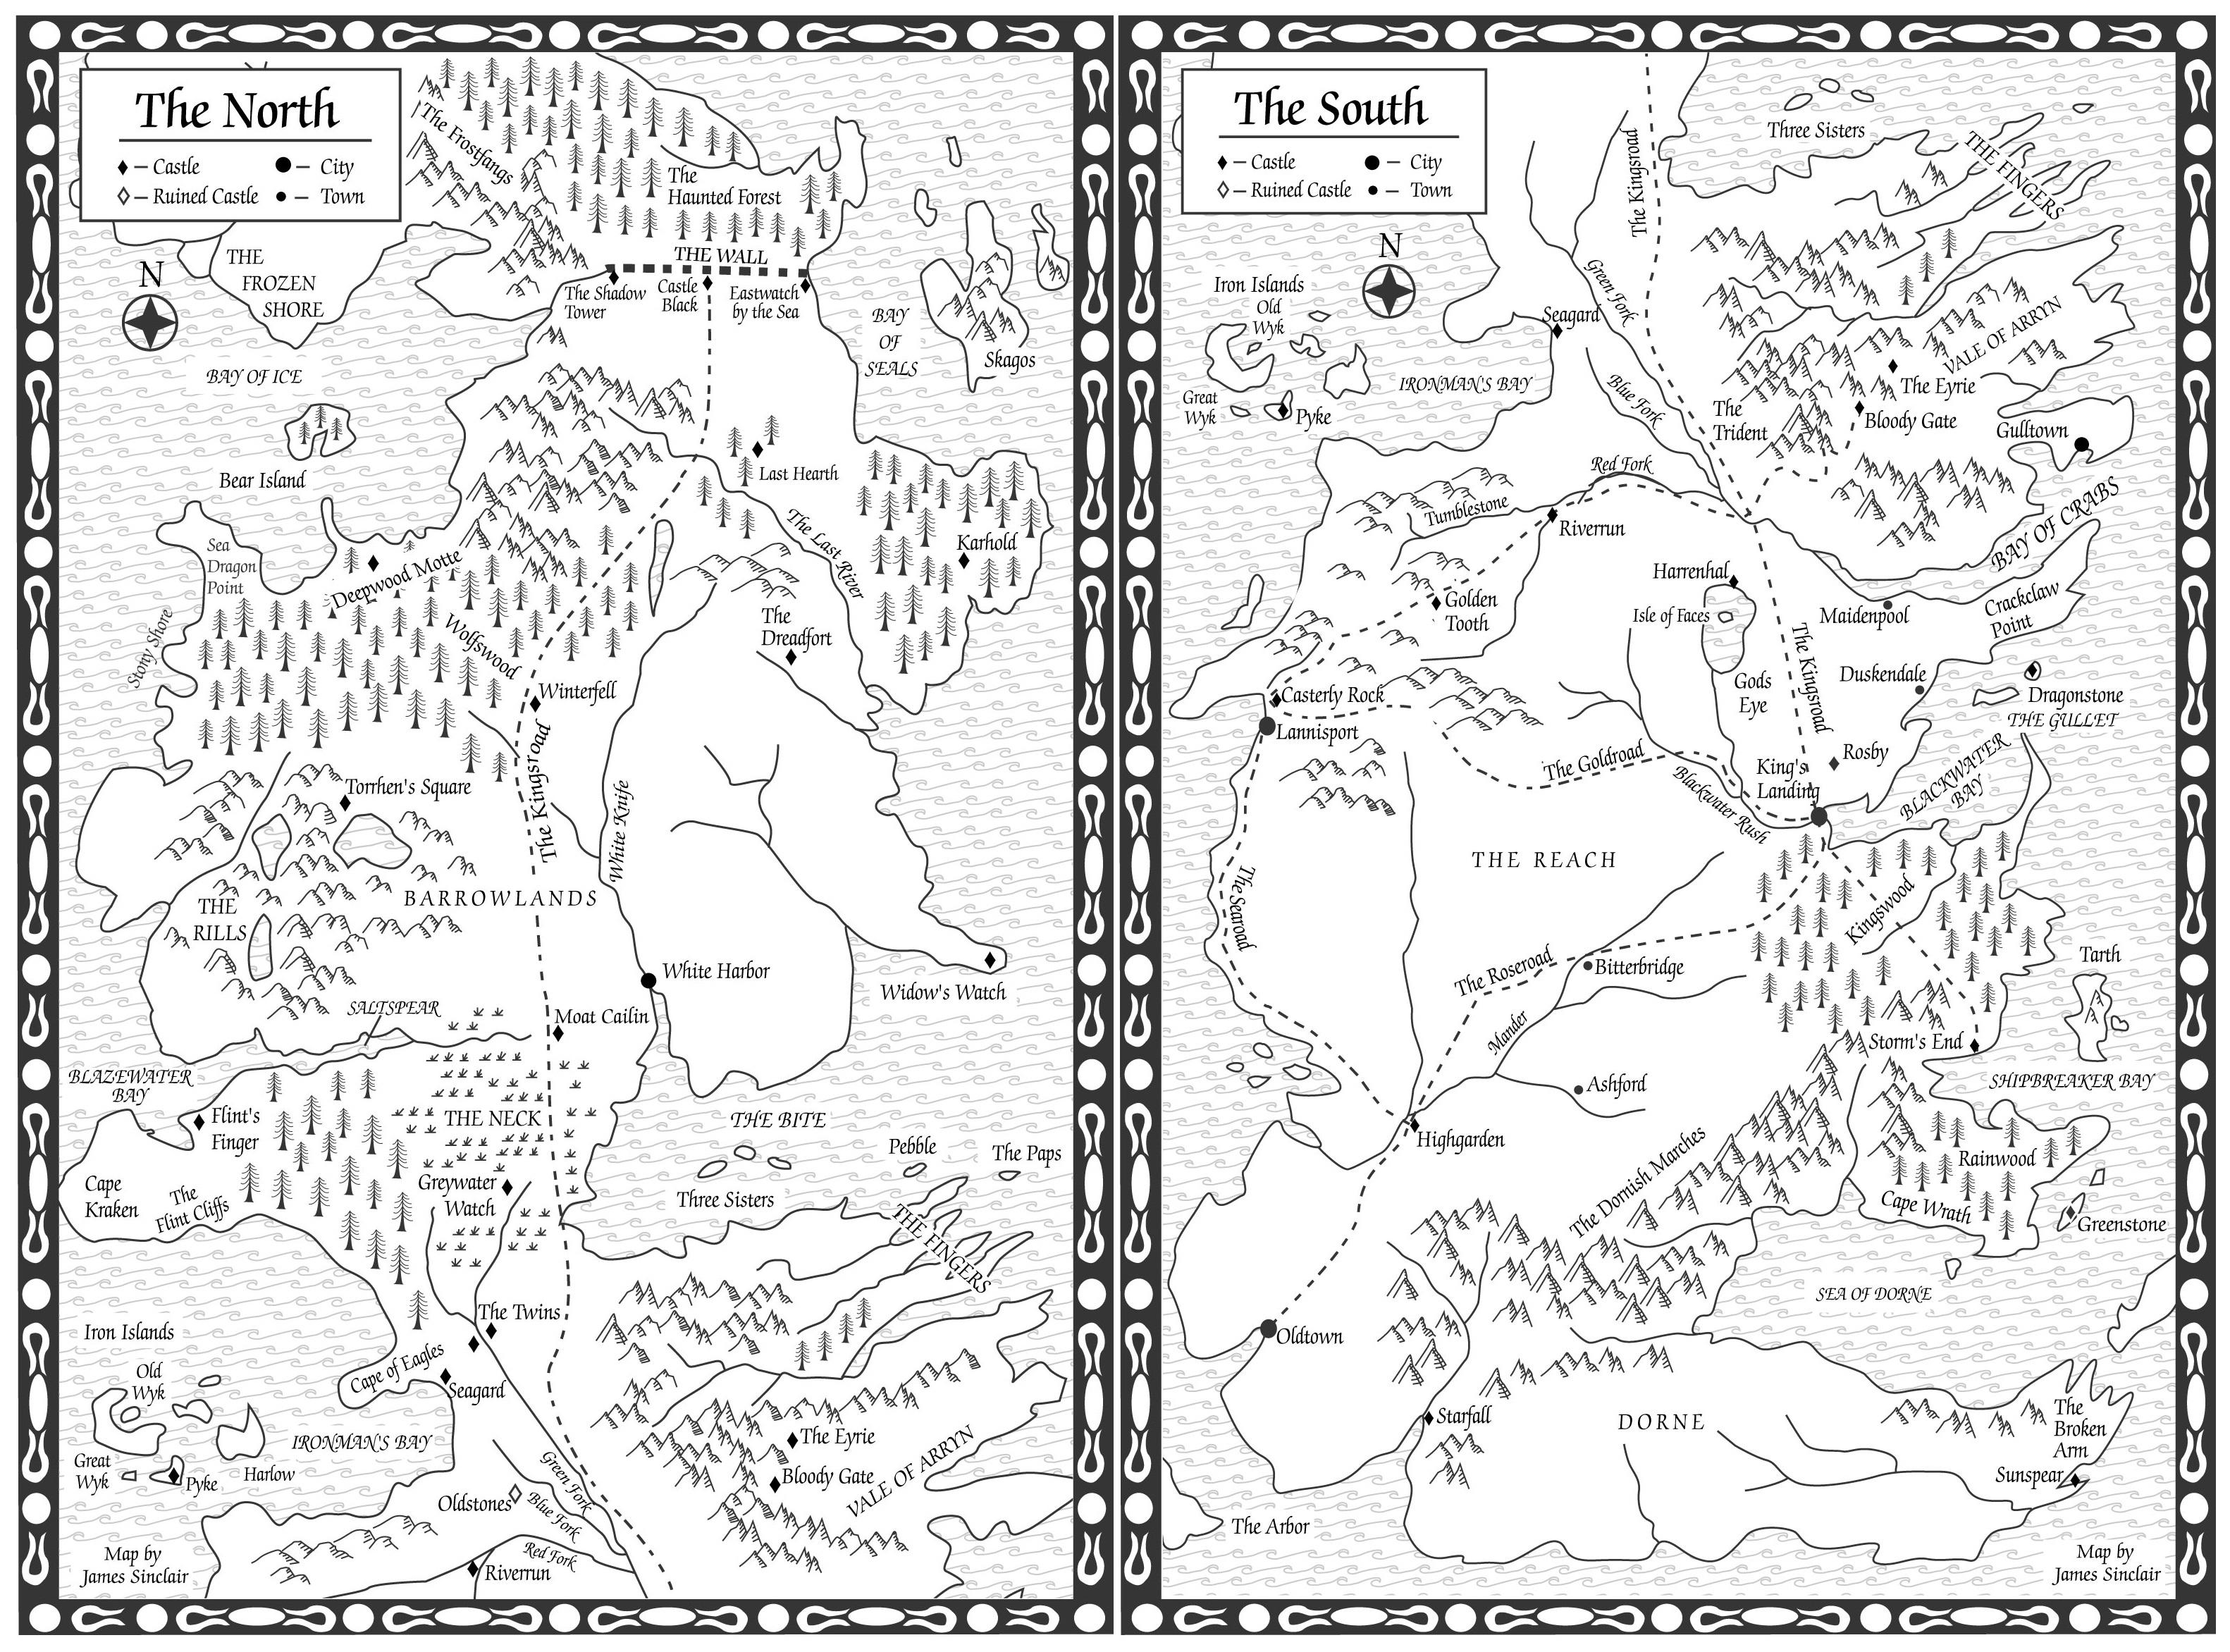 ACoK Original North Map